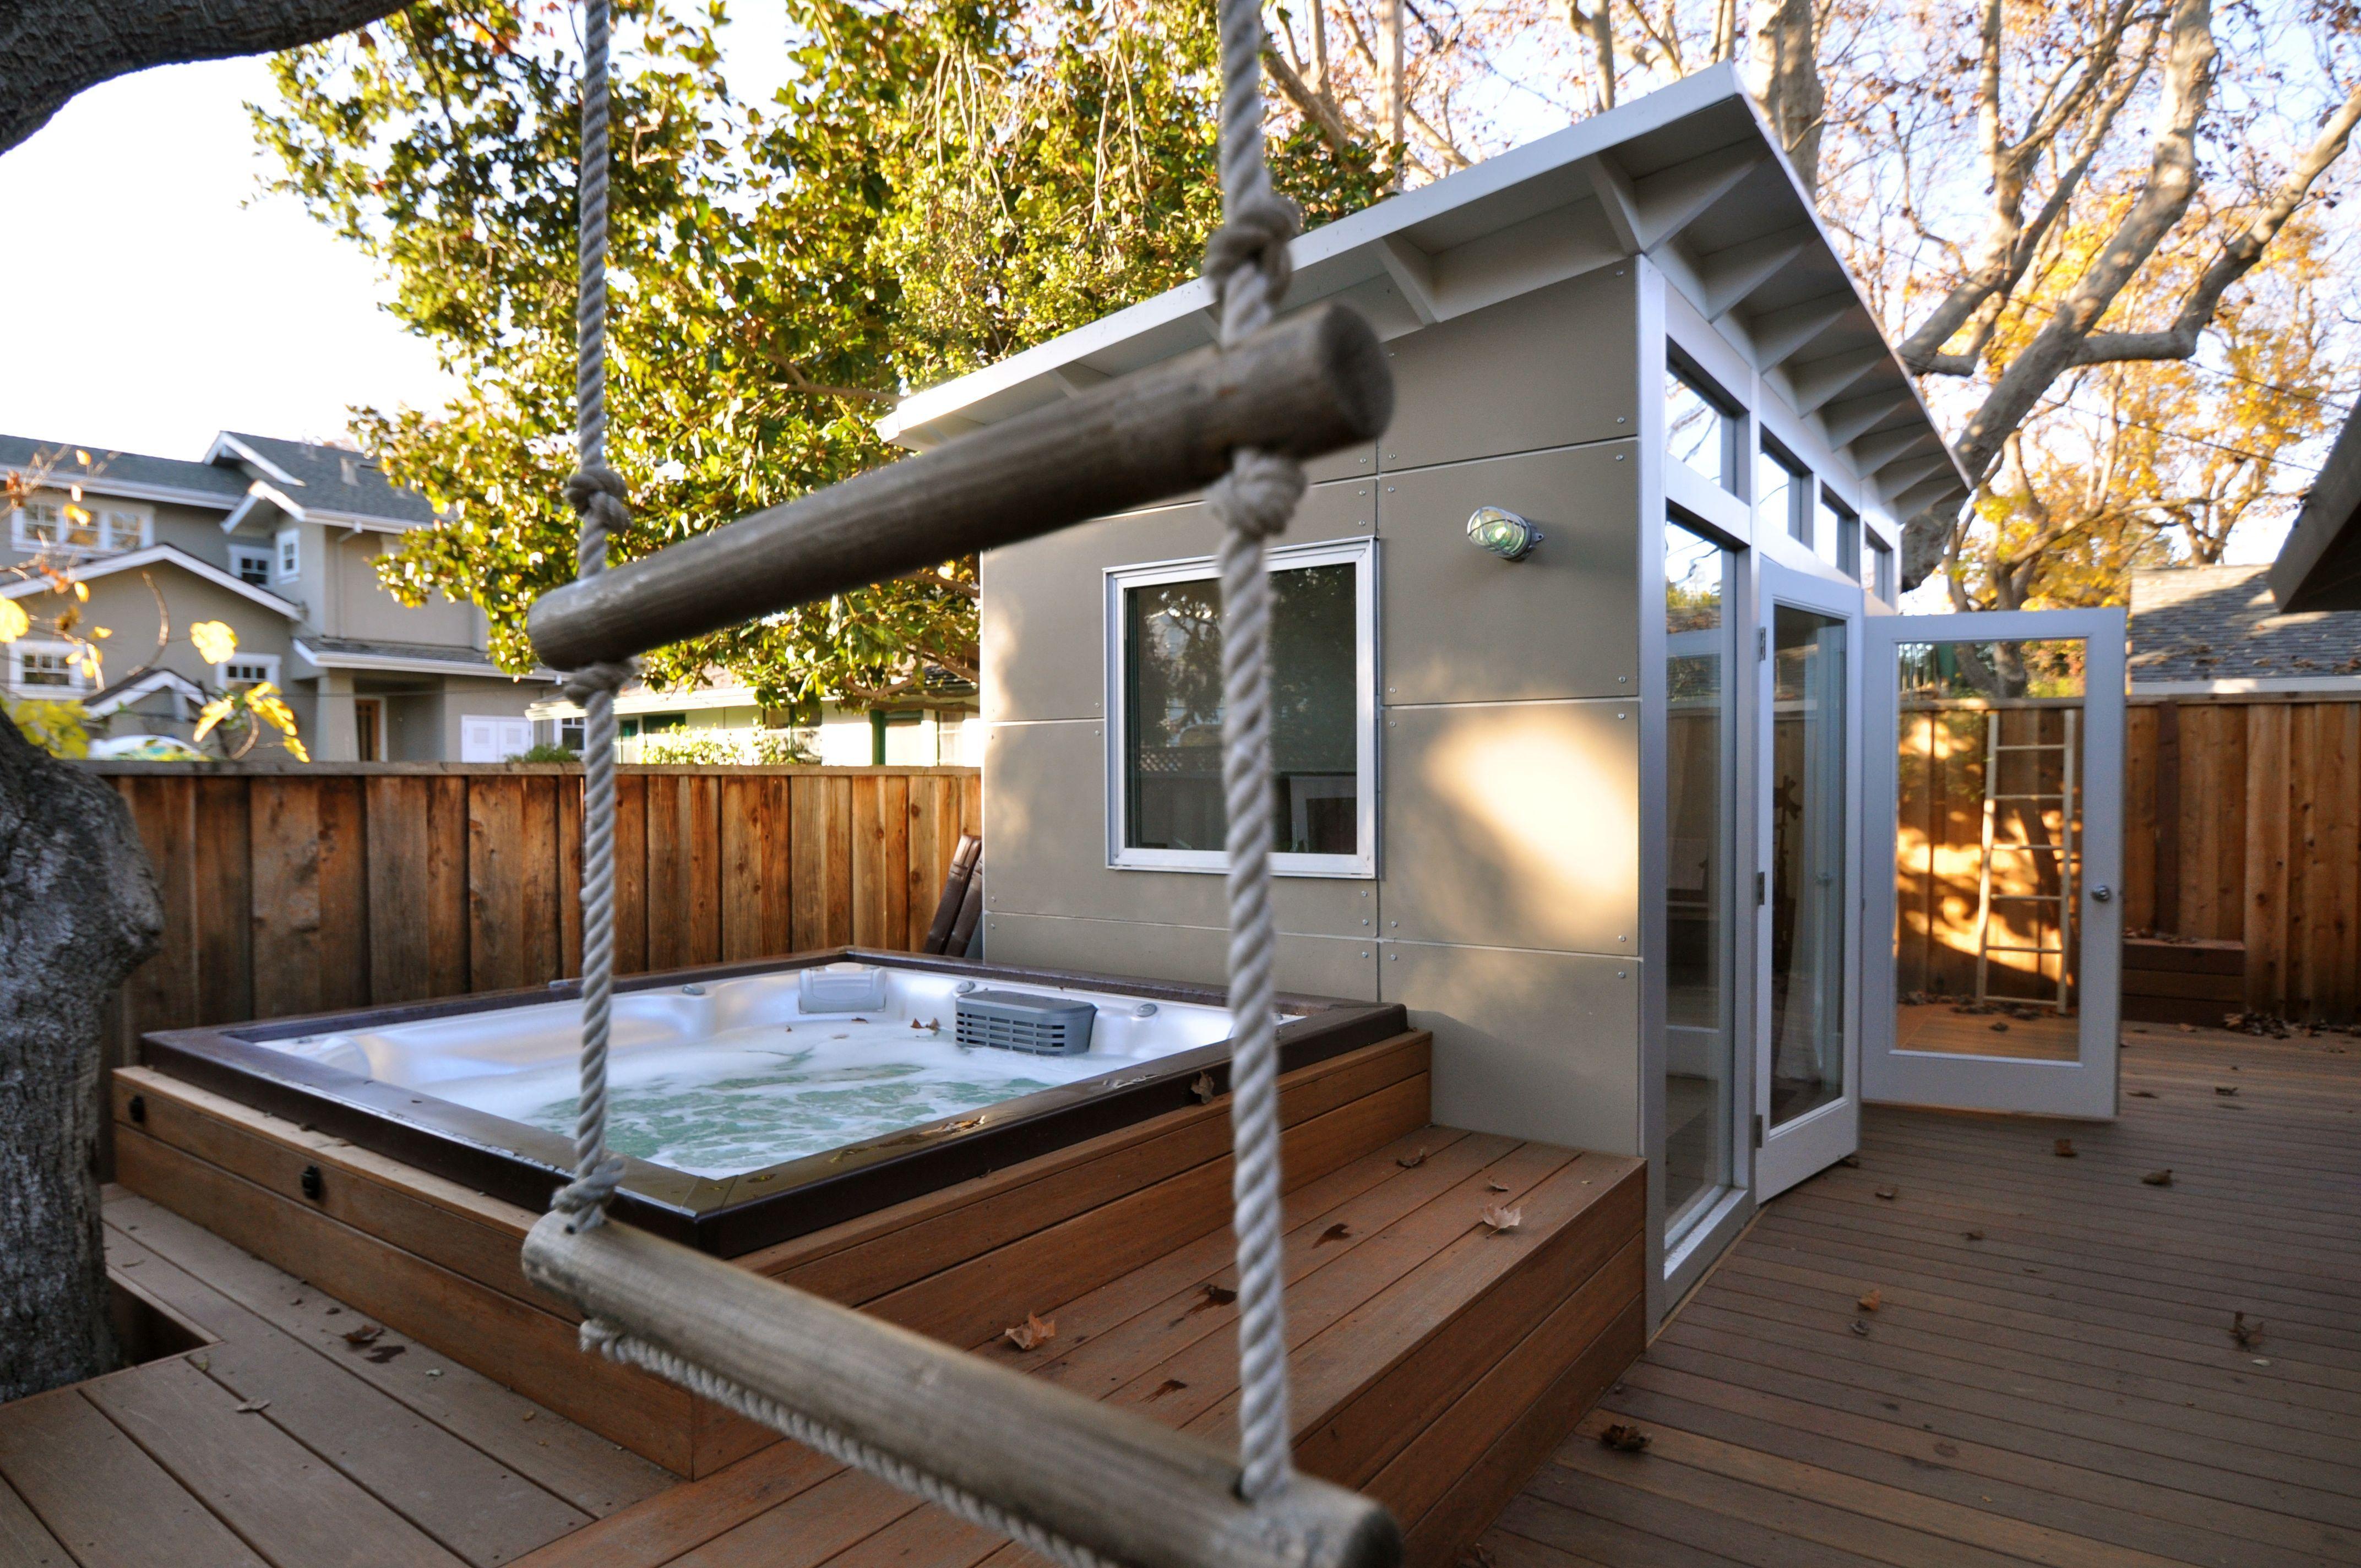 Www.studio Shed.com 8x14 Studio Shed Home Office And Music Studio Creates A  New Outdoor Space U0026 Backyard Retreat: A Wrap Around Deck, Hot Tub, An Kidu0027s  Play ...